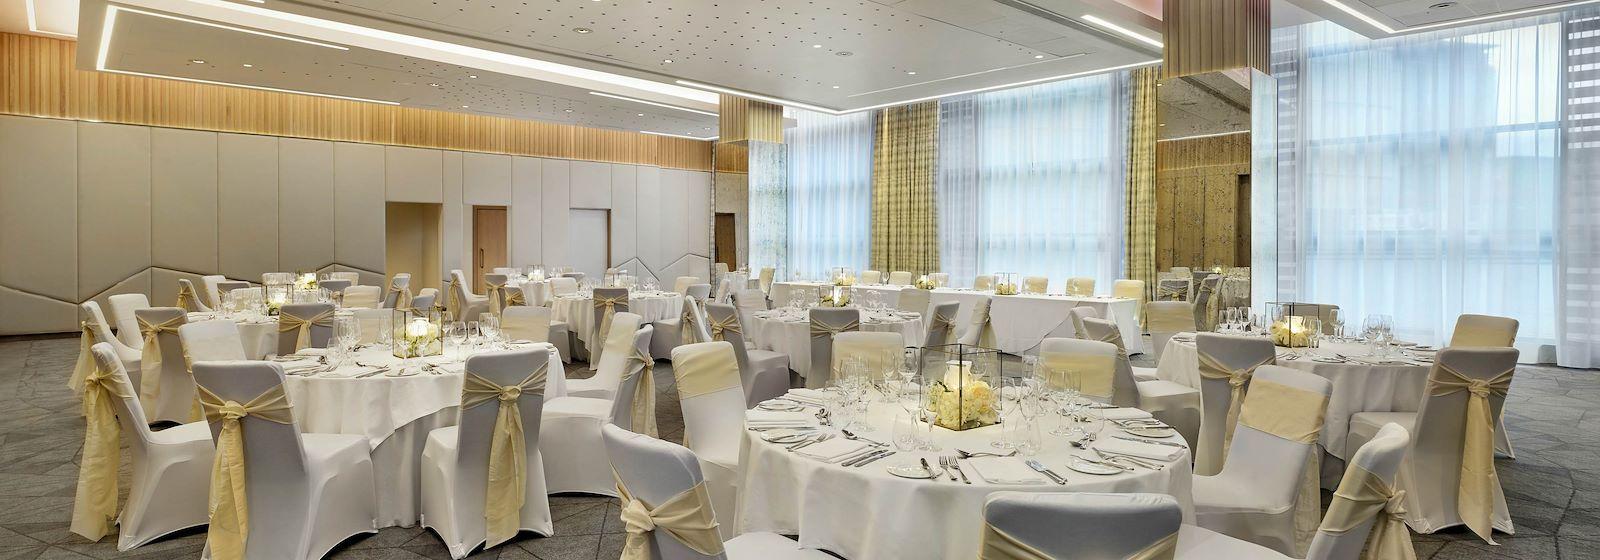 Weddings in Edinburgh, Sheraton Grand Hotel & Spa Edinburgh